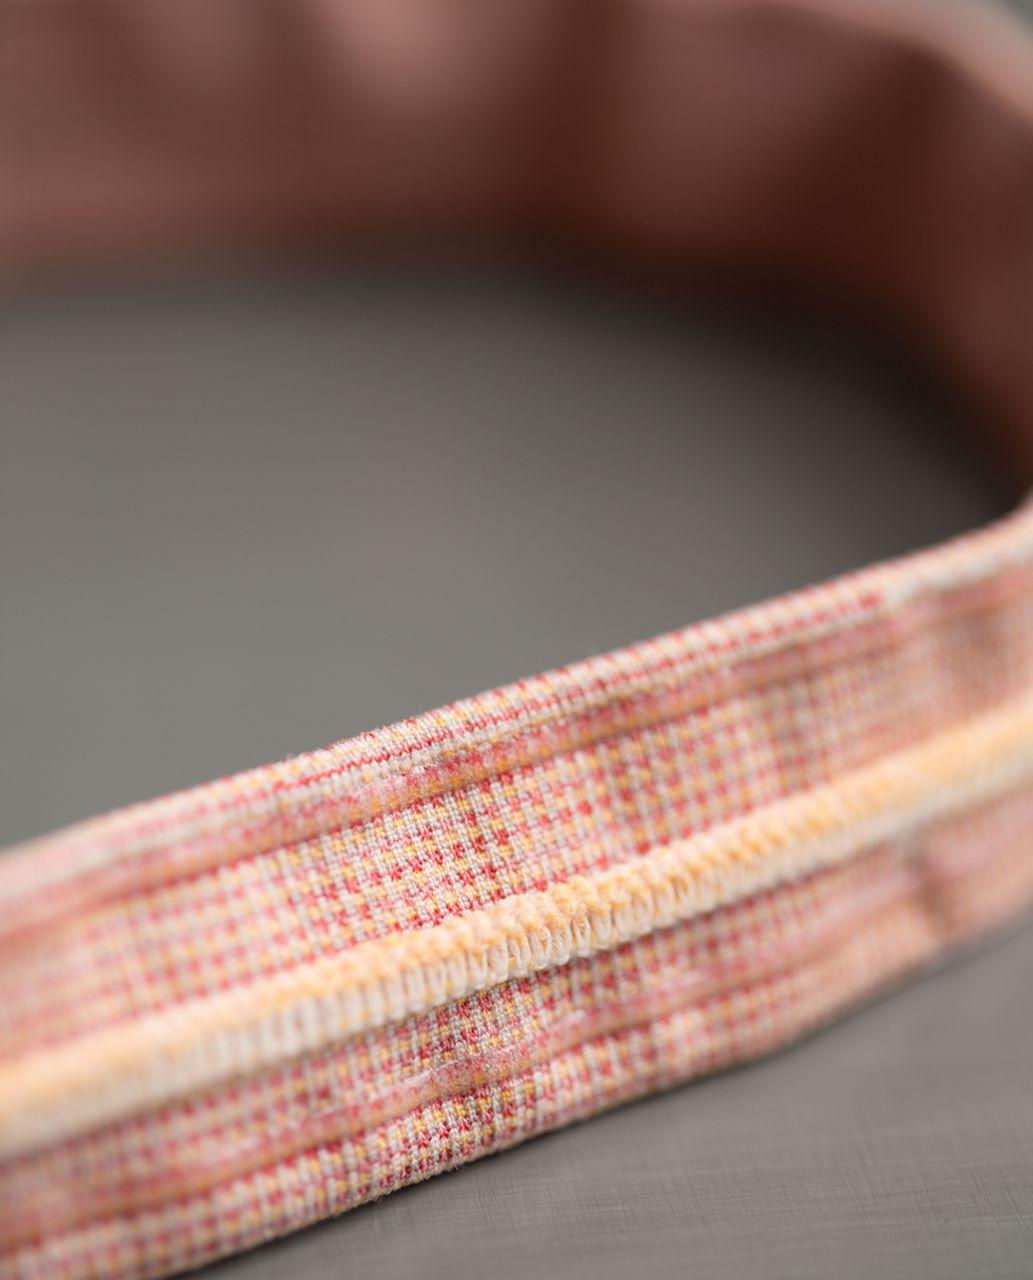 Lululemon Cardio Cross Trainer Headband - Jewelled Magenta / Peach Fuzz